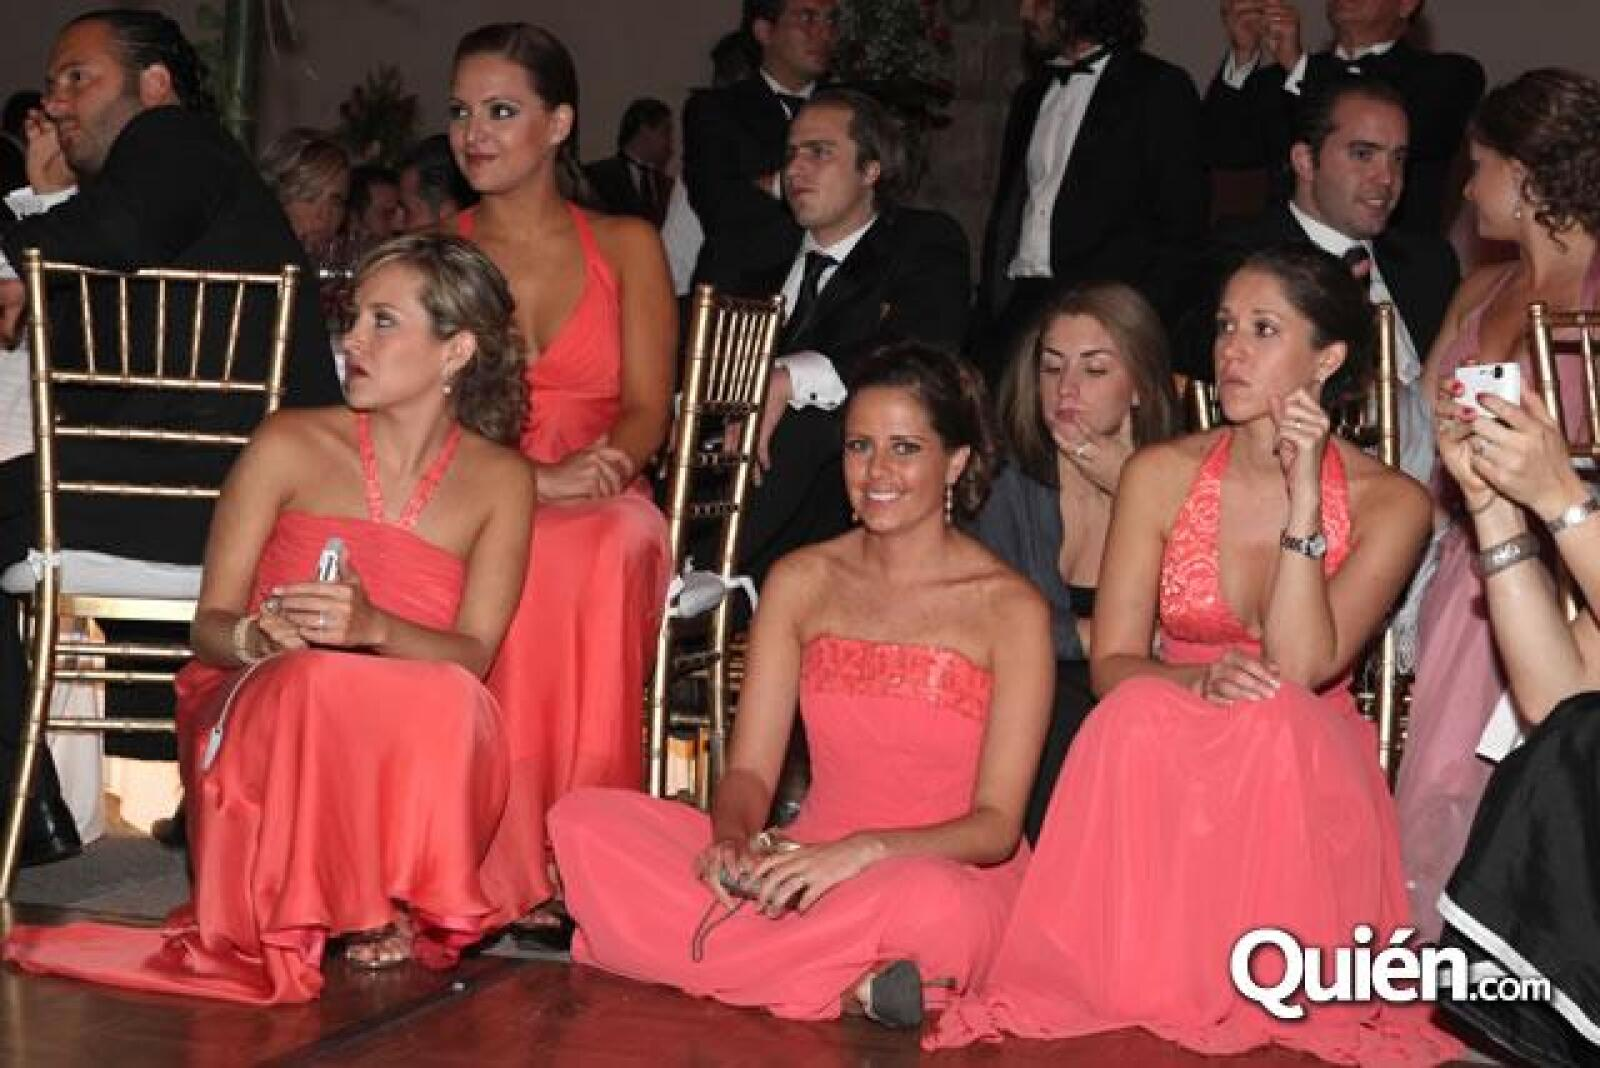 Adriana Carranza,Pamela Ortiz,Jessica Huerta,Adriana del Conde